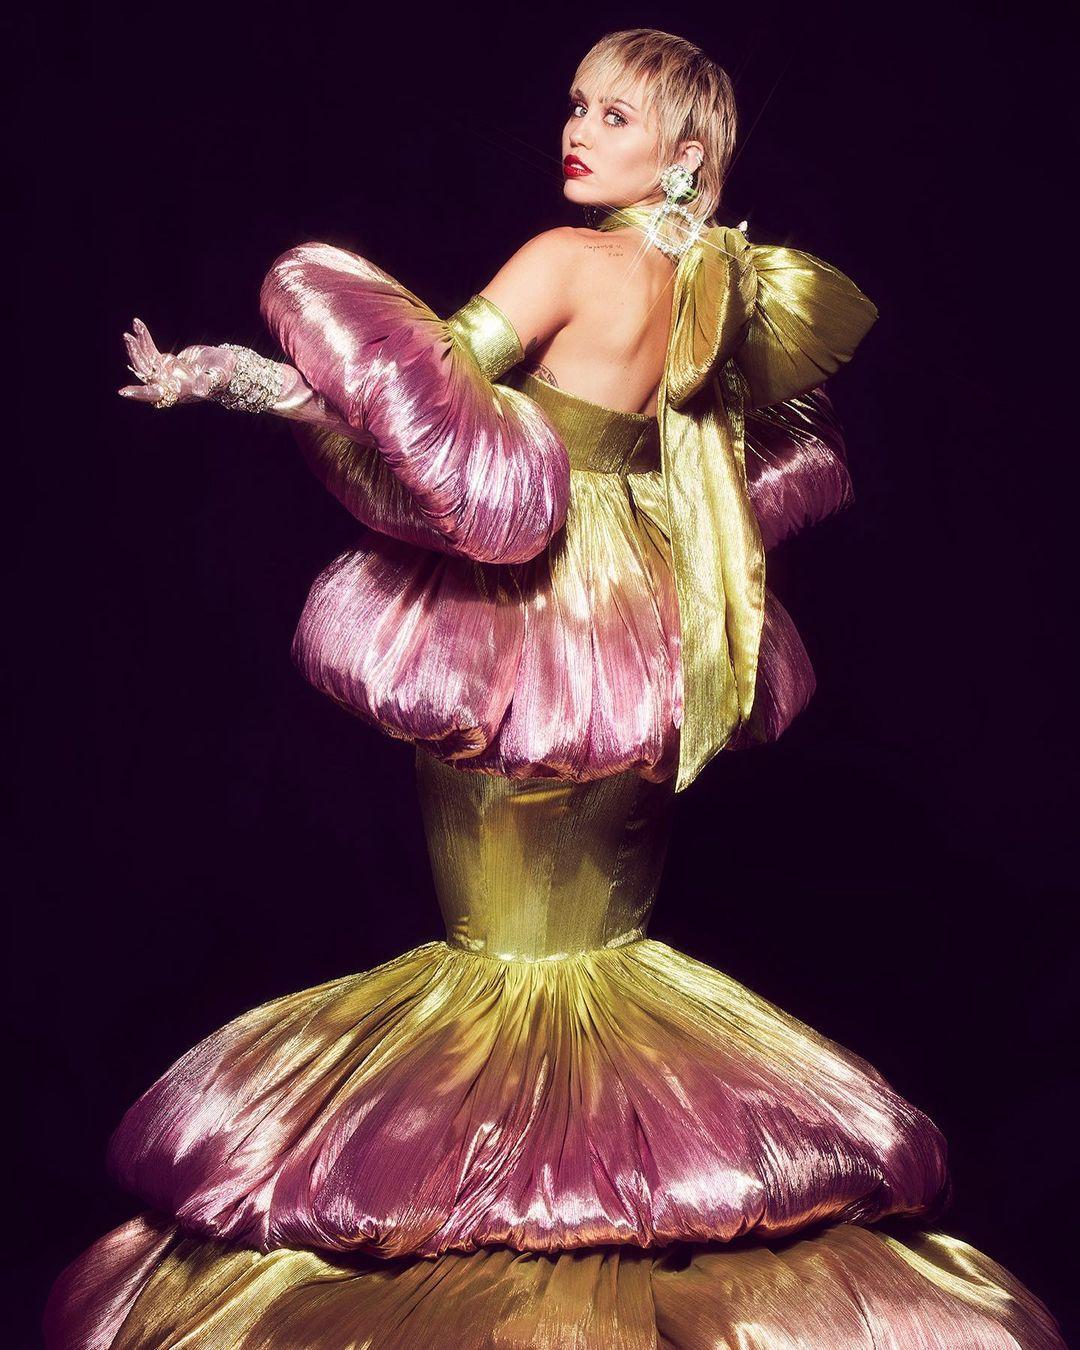 miley cyrus plastic heart 1 - Miley Cyrus & Stevie Nicks - Edge of Midnight (Midnight Sky Remix)